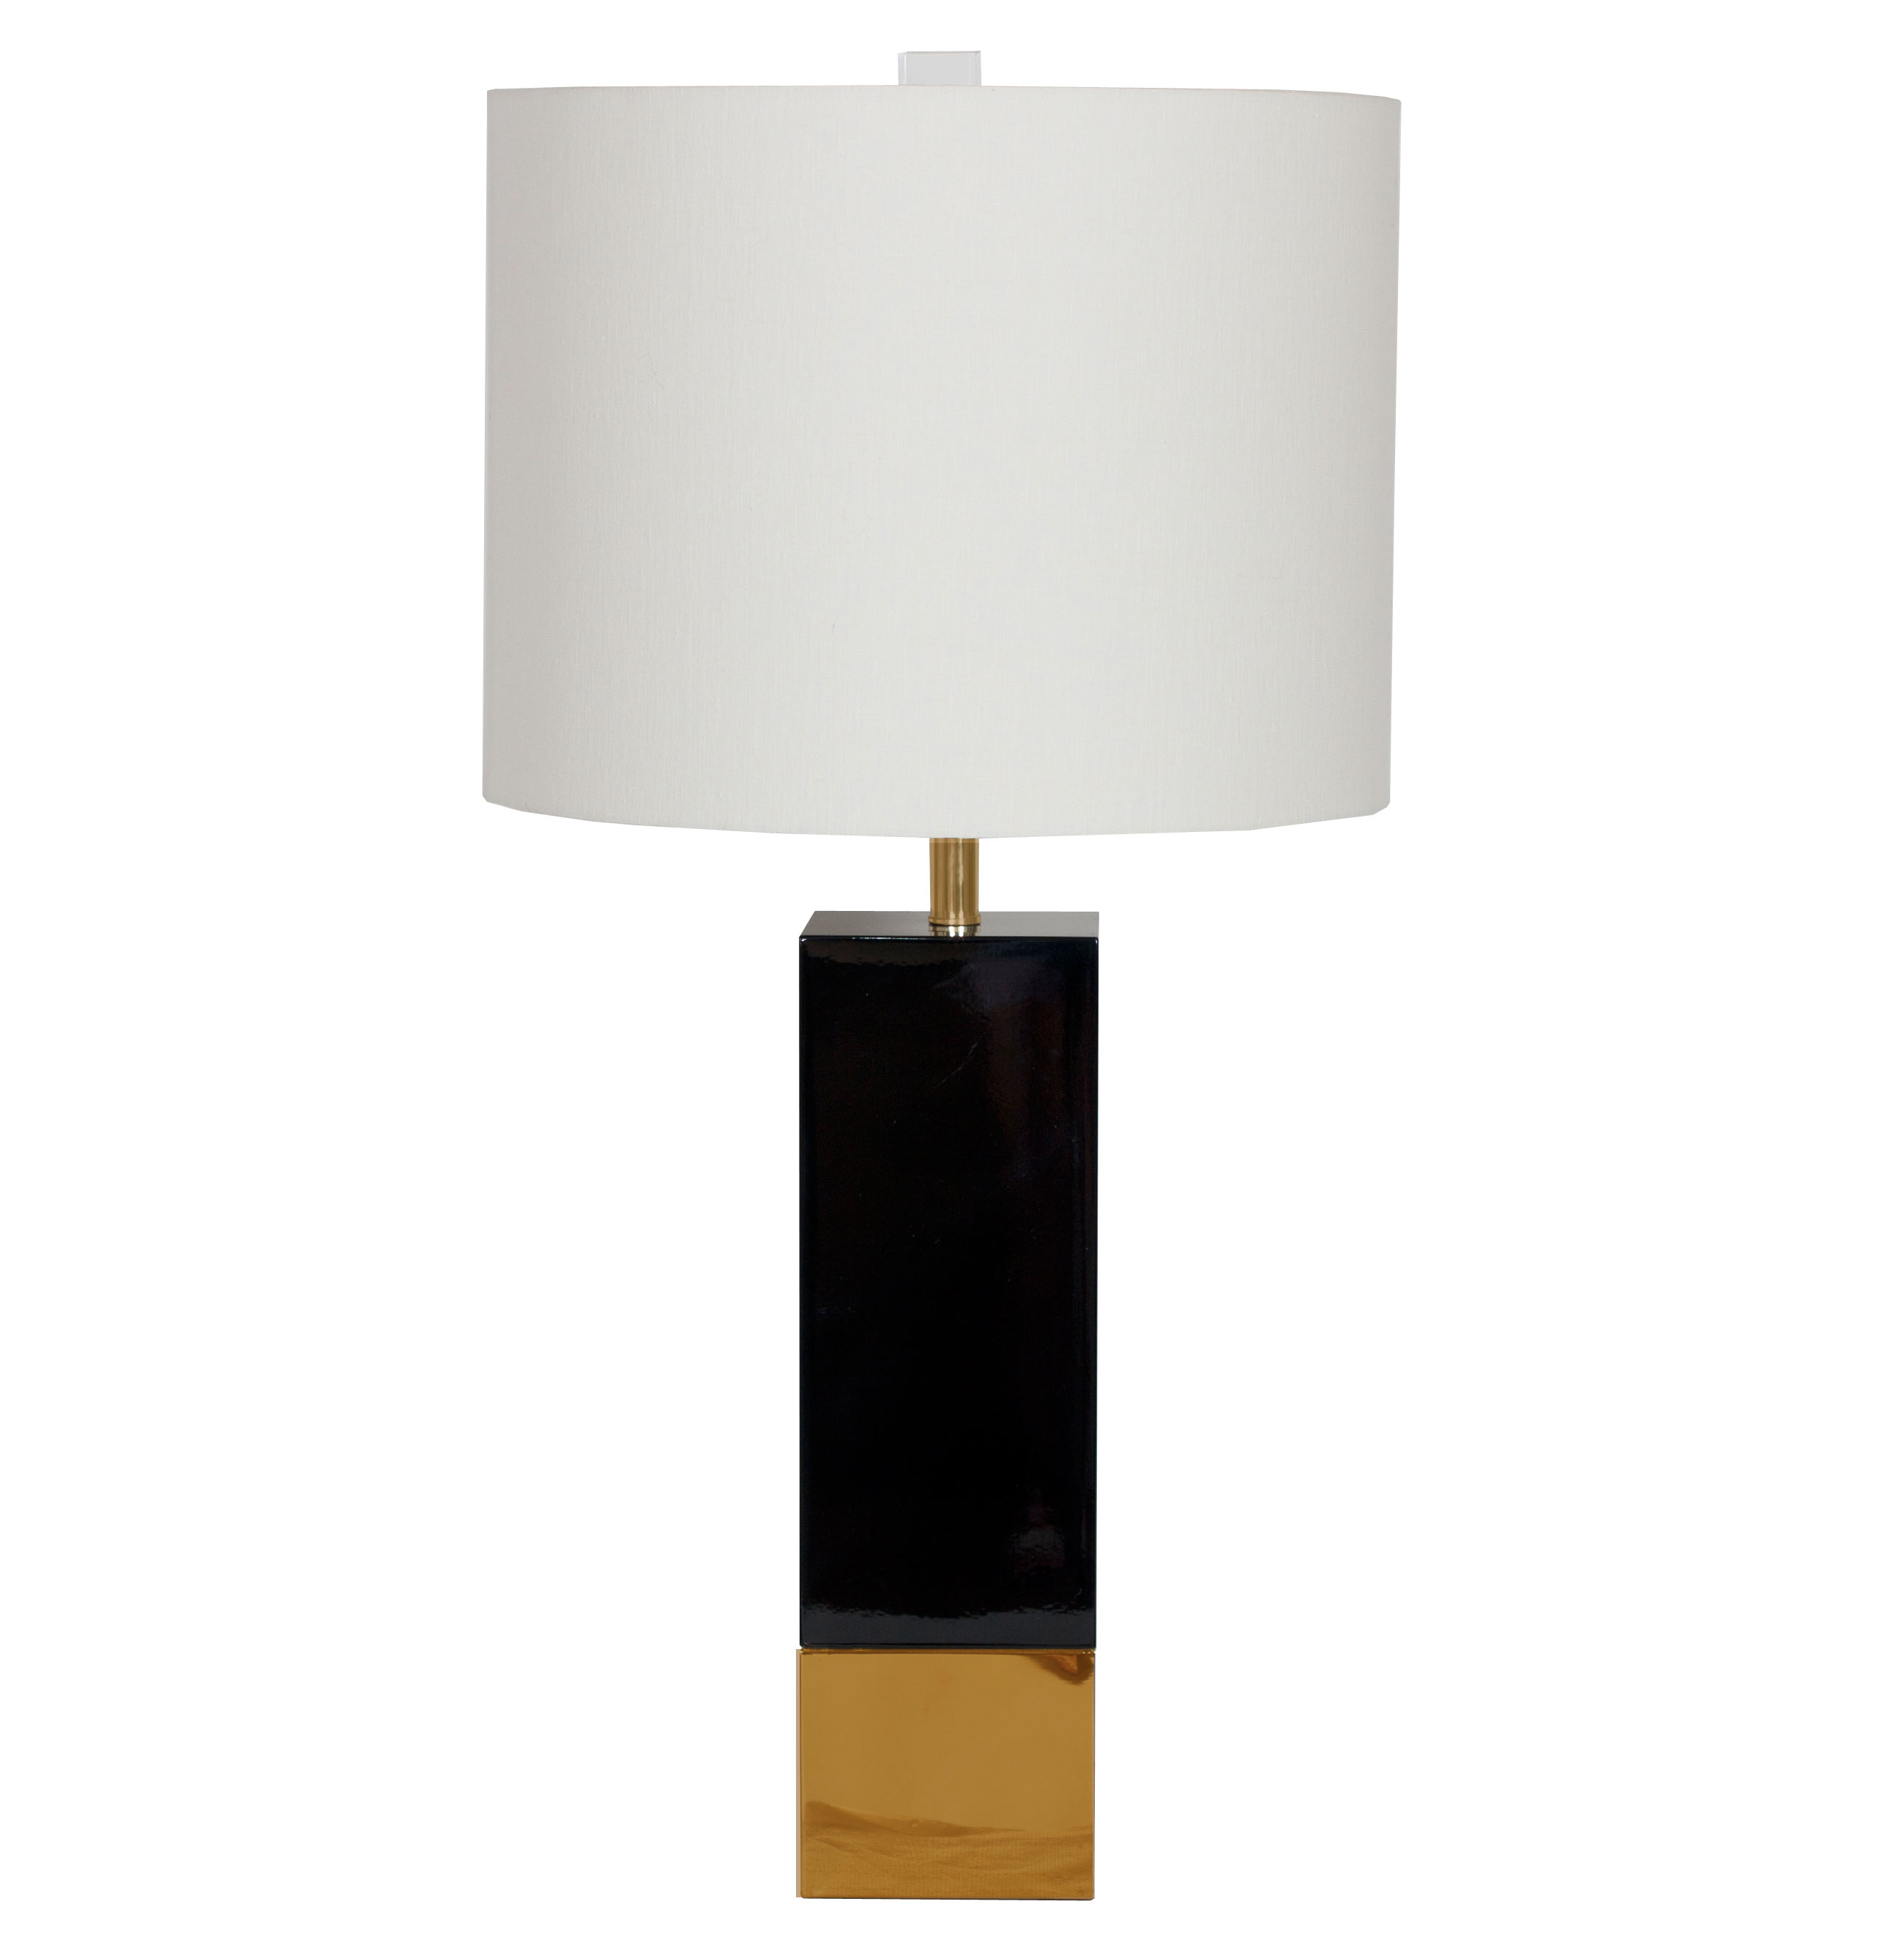 Titan Hollywood Regency Gold Black Square Table Lamp